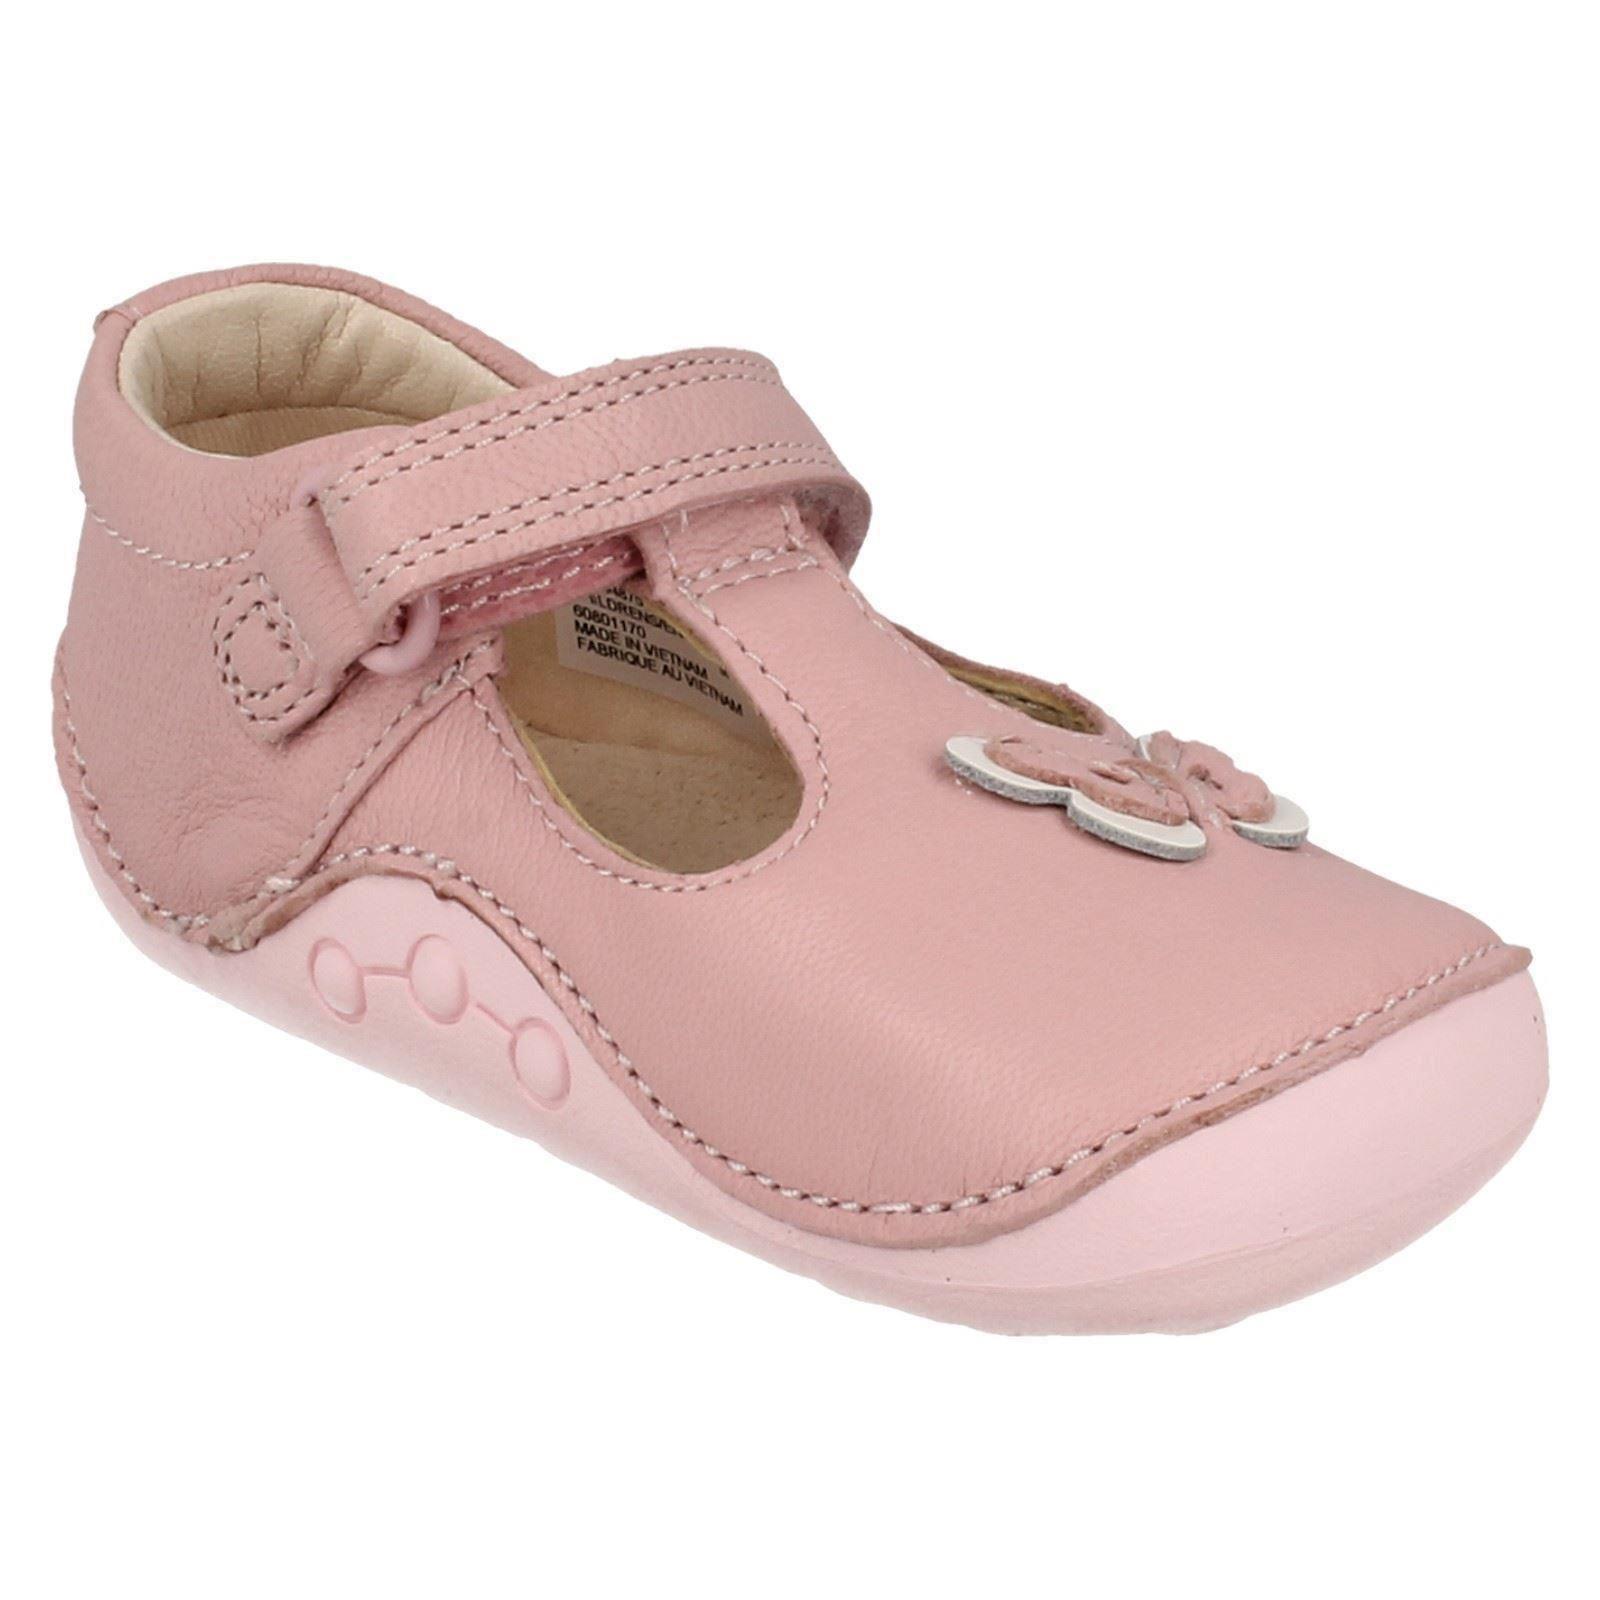 Girls Clarks First Shoes Little Wow